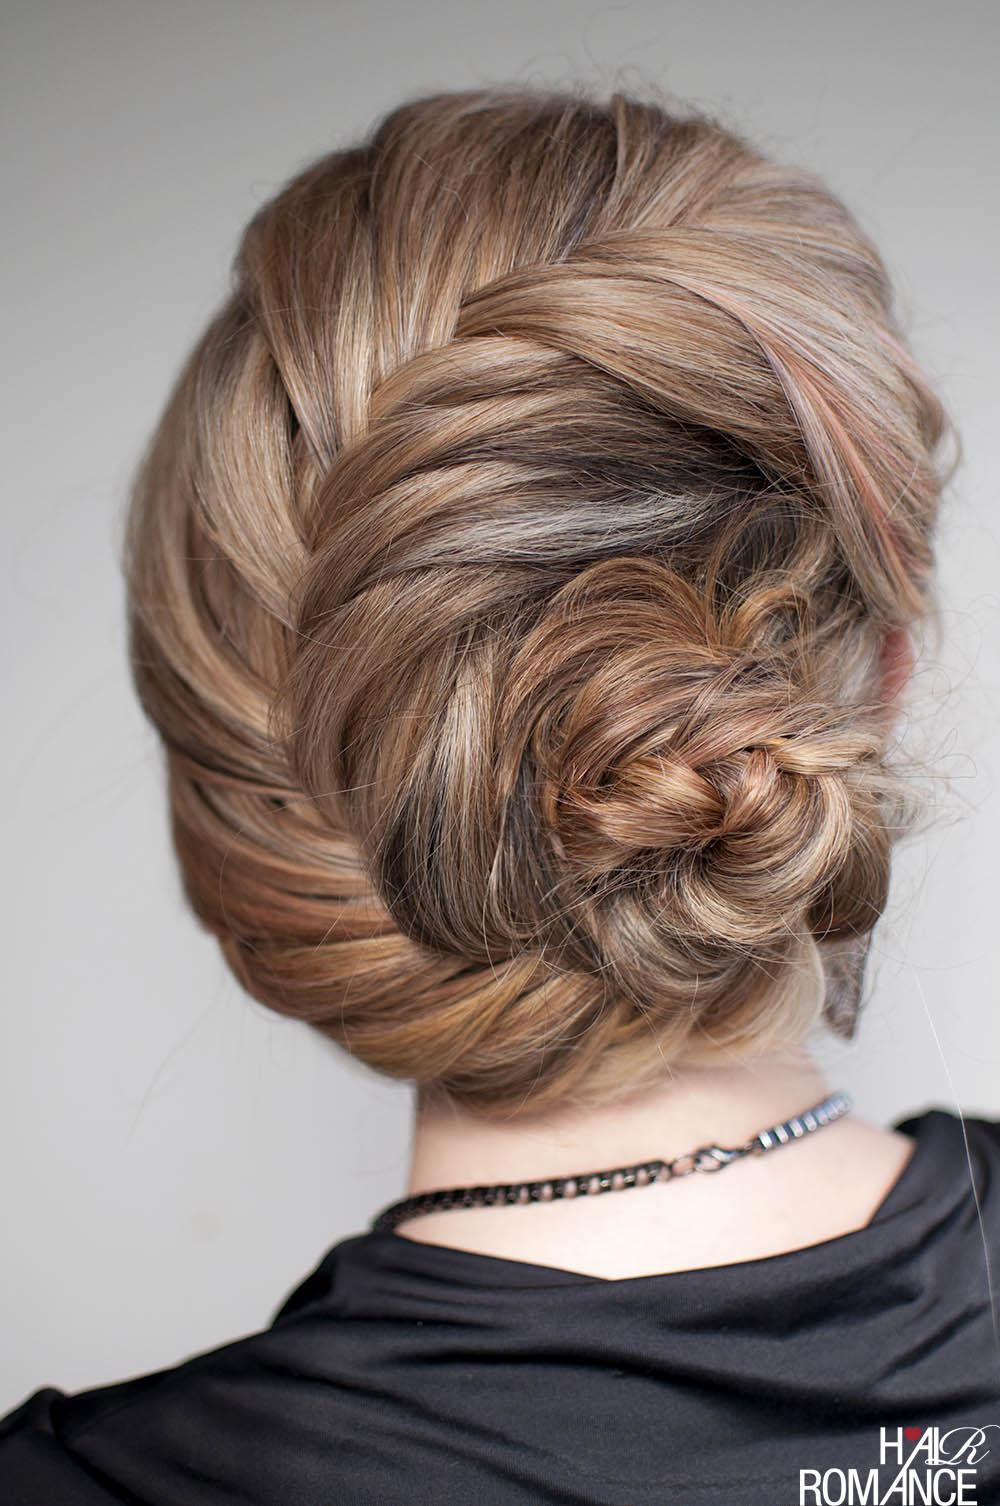 How To Photograph Hair 10 Pro Tips Hair Romance